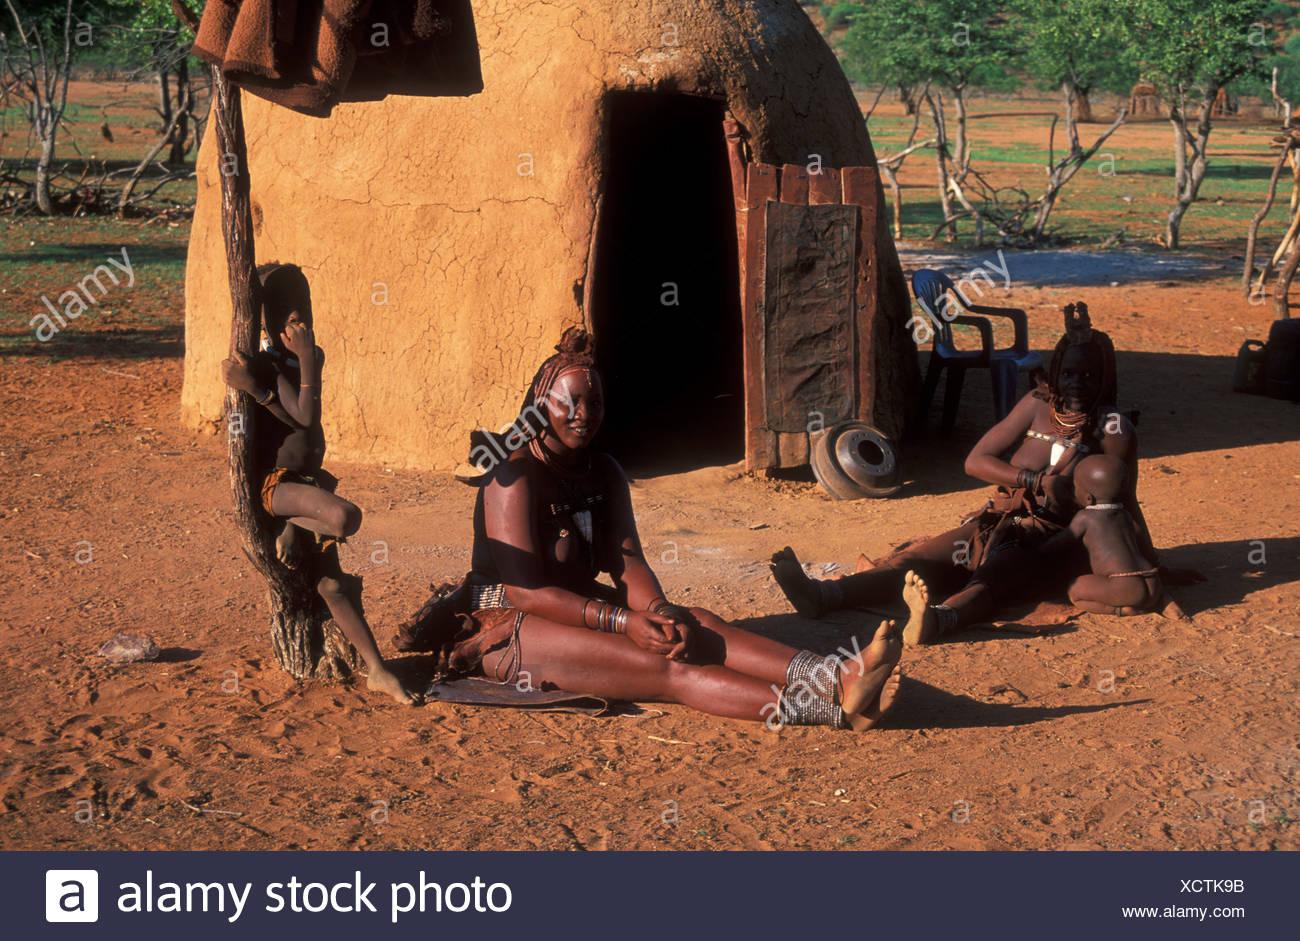 Africa children front headdress Himba hut inside Kaokoveld Kraal married Namibia Africa Ovahimbe tribe - Stock Image